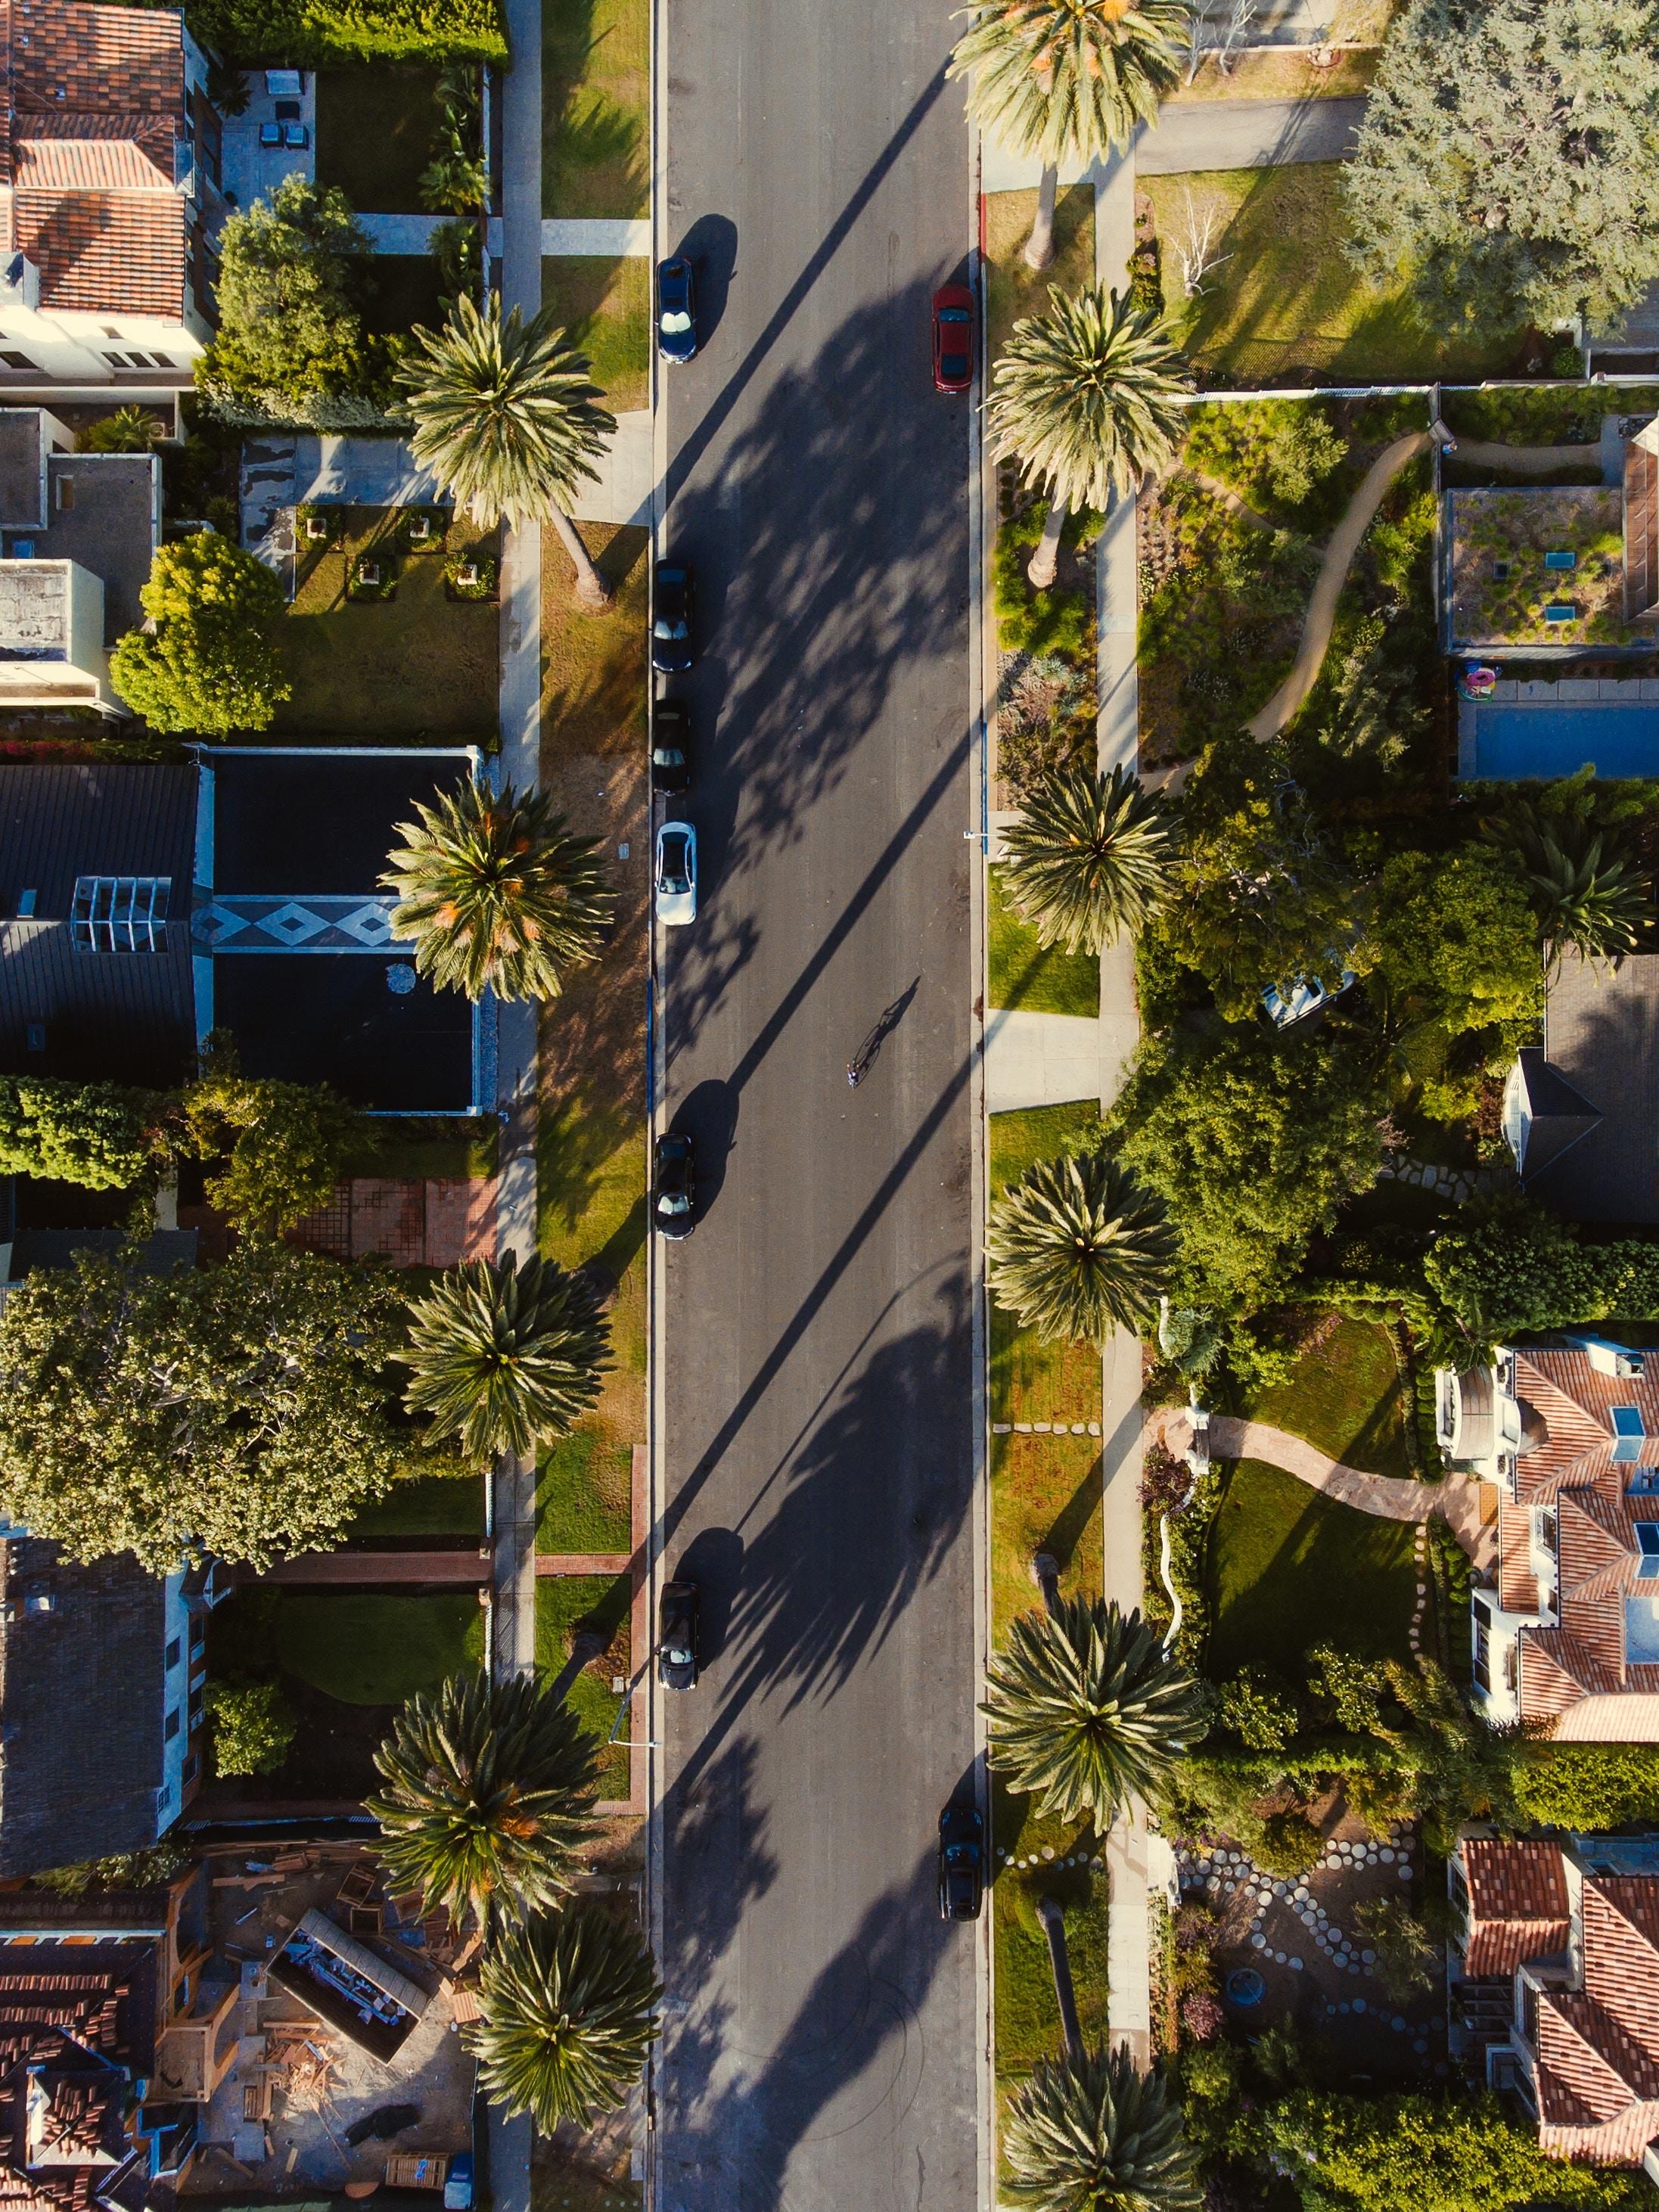 Bologna – Los Angeles – Pasadena